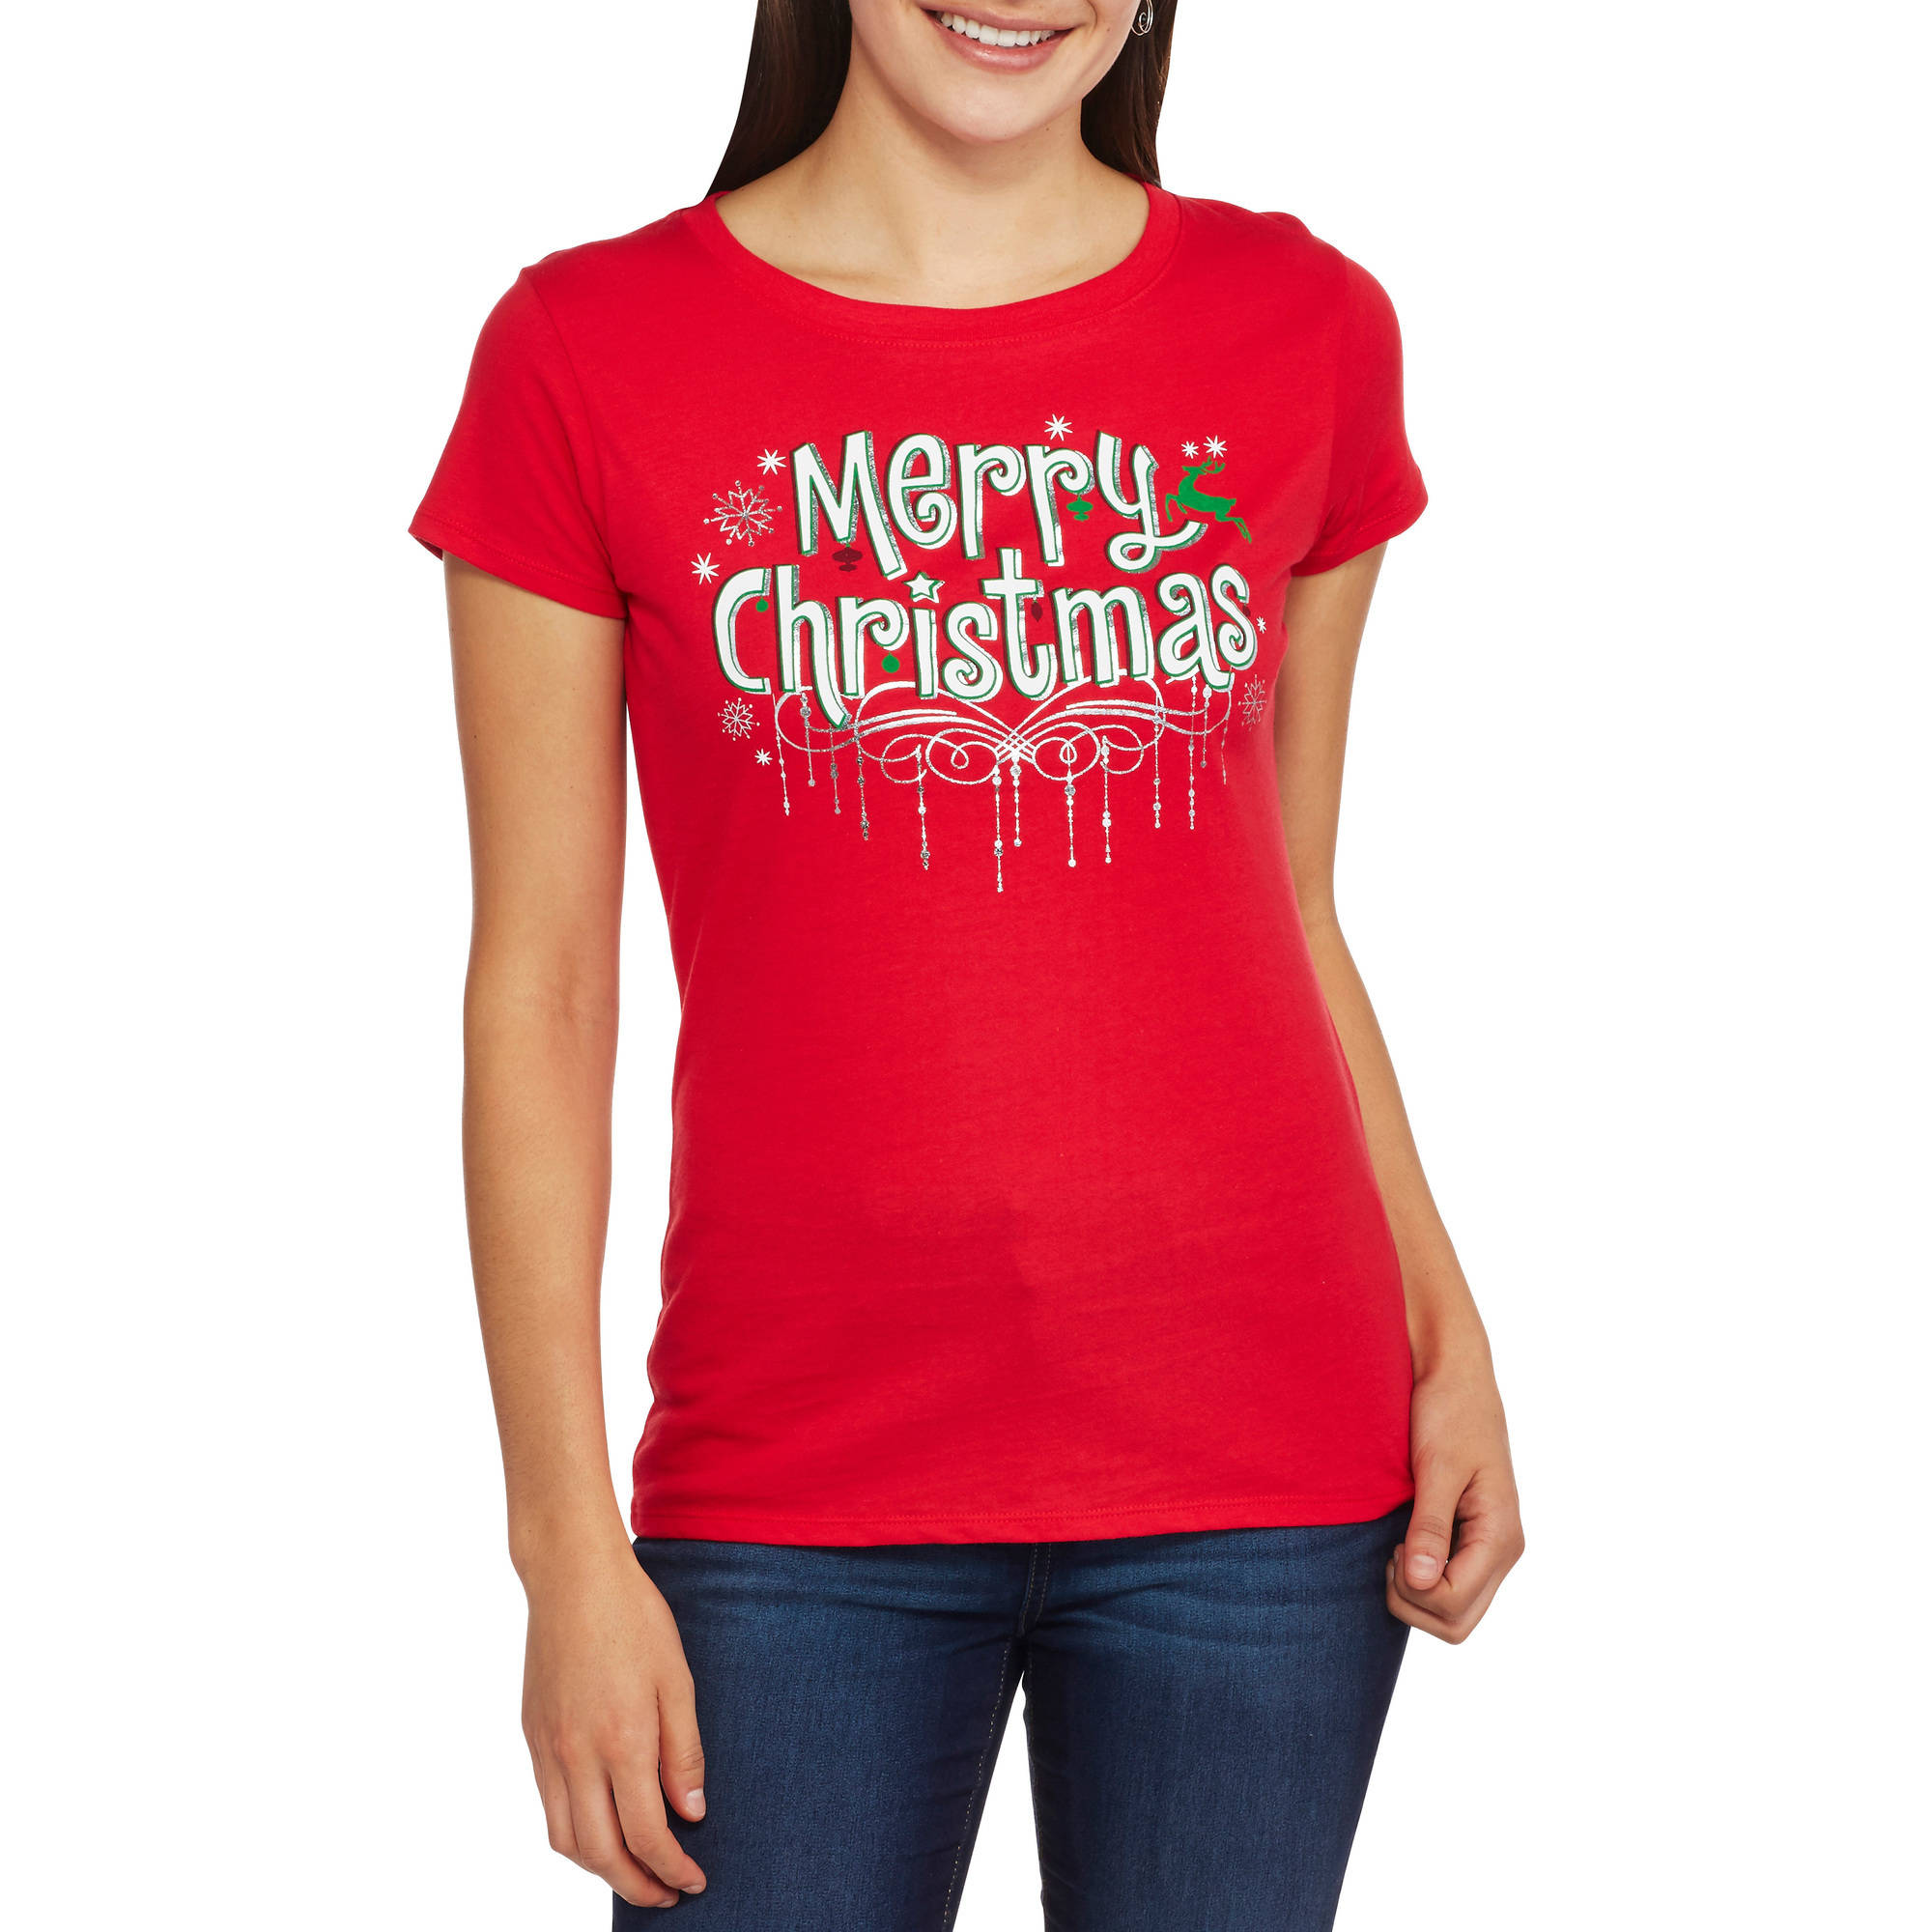 Women's Merry Christmas Short Sleeve Graphic Christmas T-Shirt